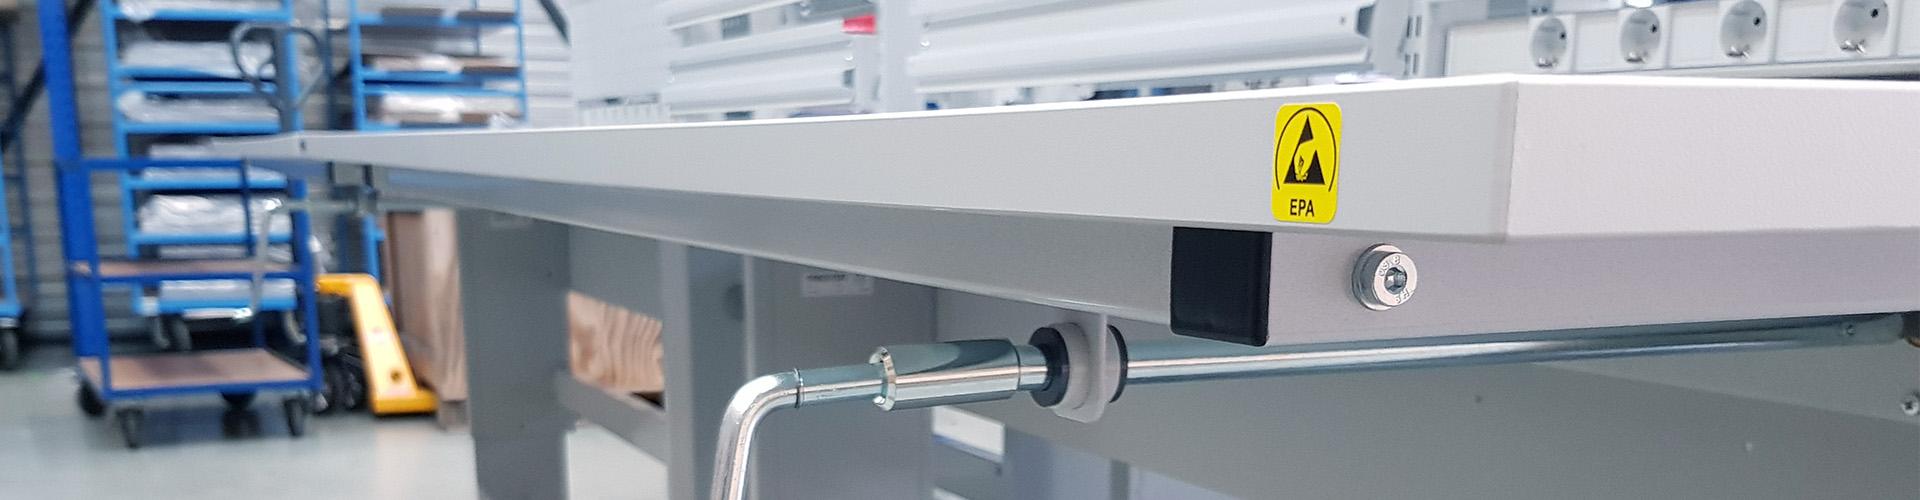 Sovella Nederland Treston header concept werktafel met zwengel verstelling en ESD-veilig